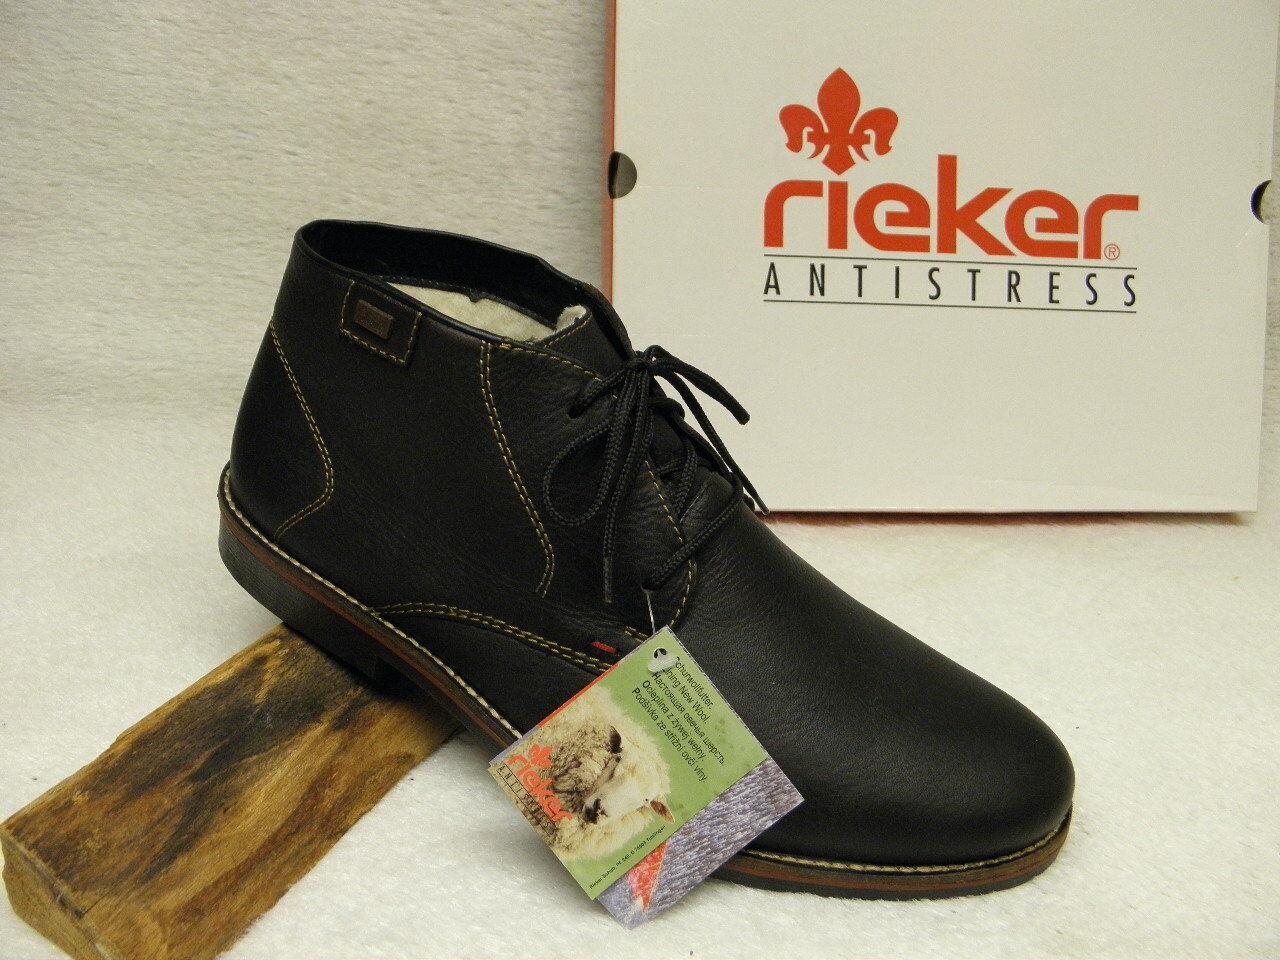 Rieker ® rojouce, hasta ahora de , botas + gratis premium-calcetines (d431)